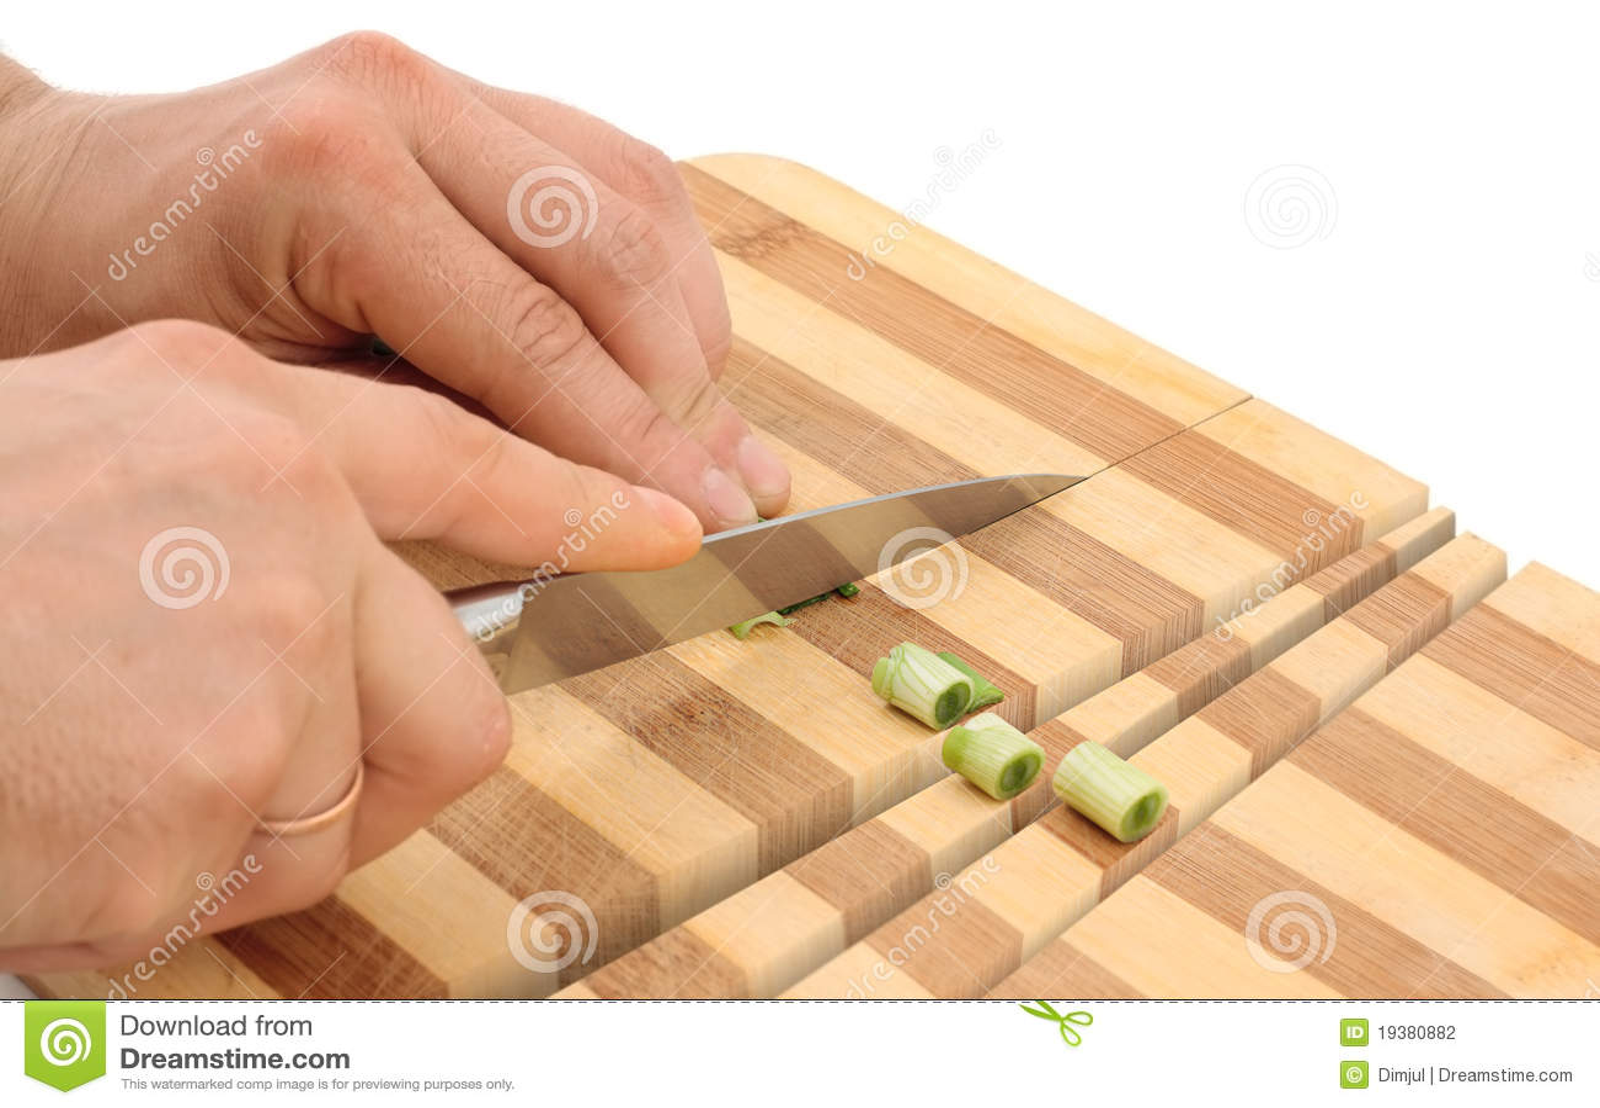 Knife Cuts Wood Cutting Board Stock Photography - Image ...